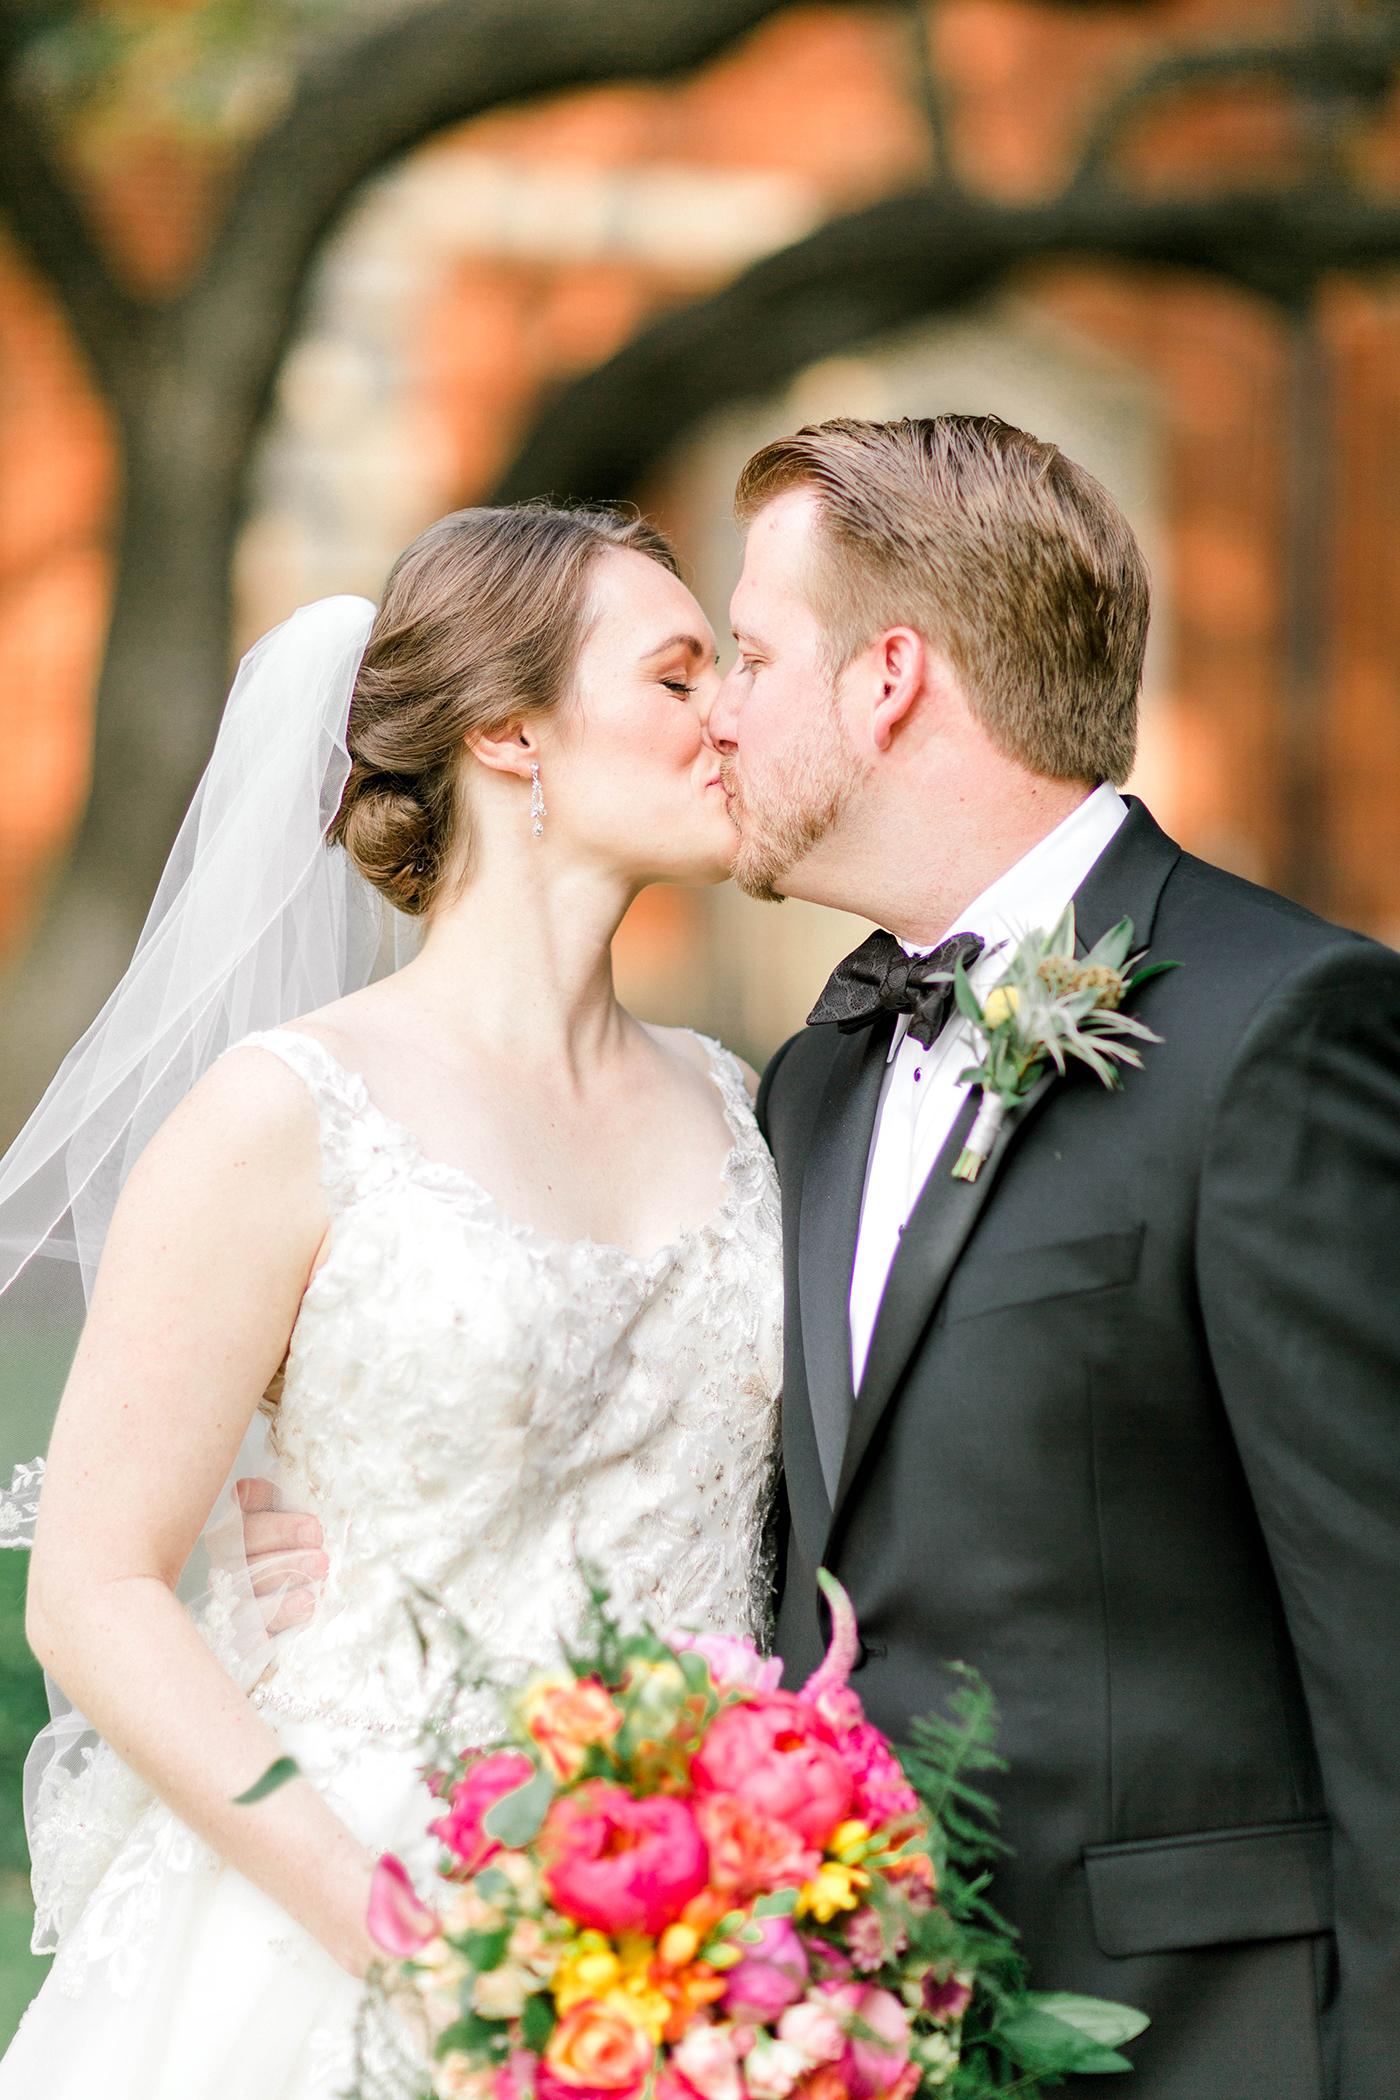 Dallas TX Wedding Planner - Allday Events - Hall on Dragon Wedding - 00008.jpg